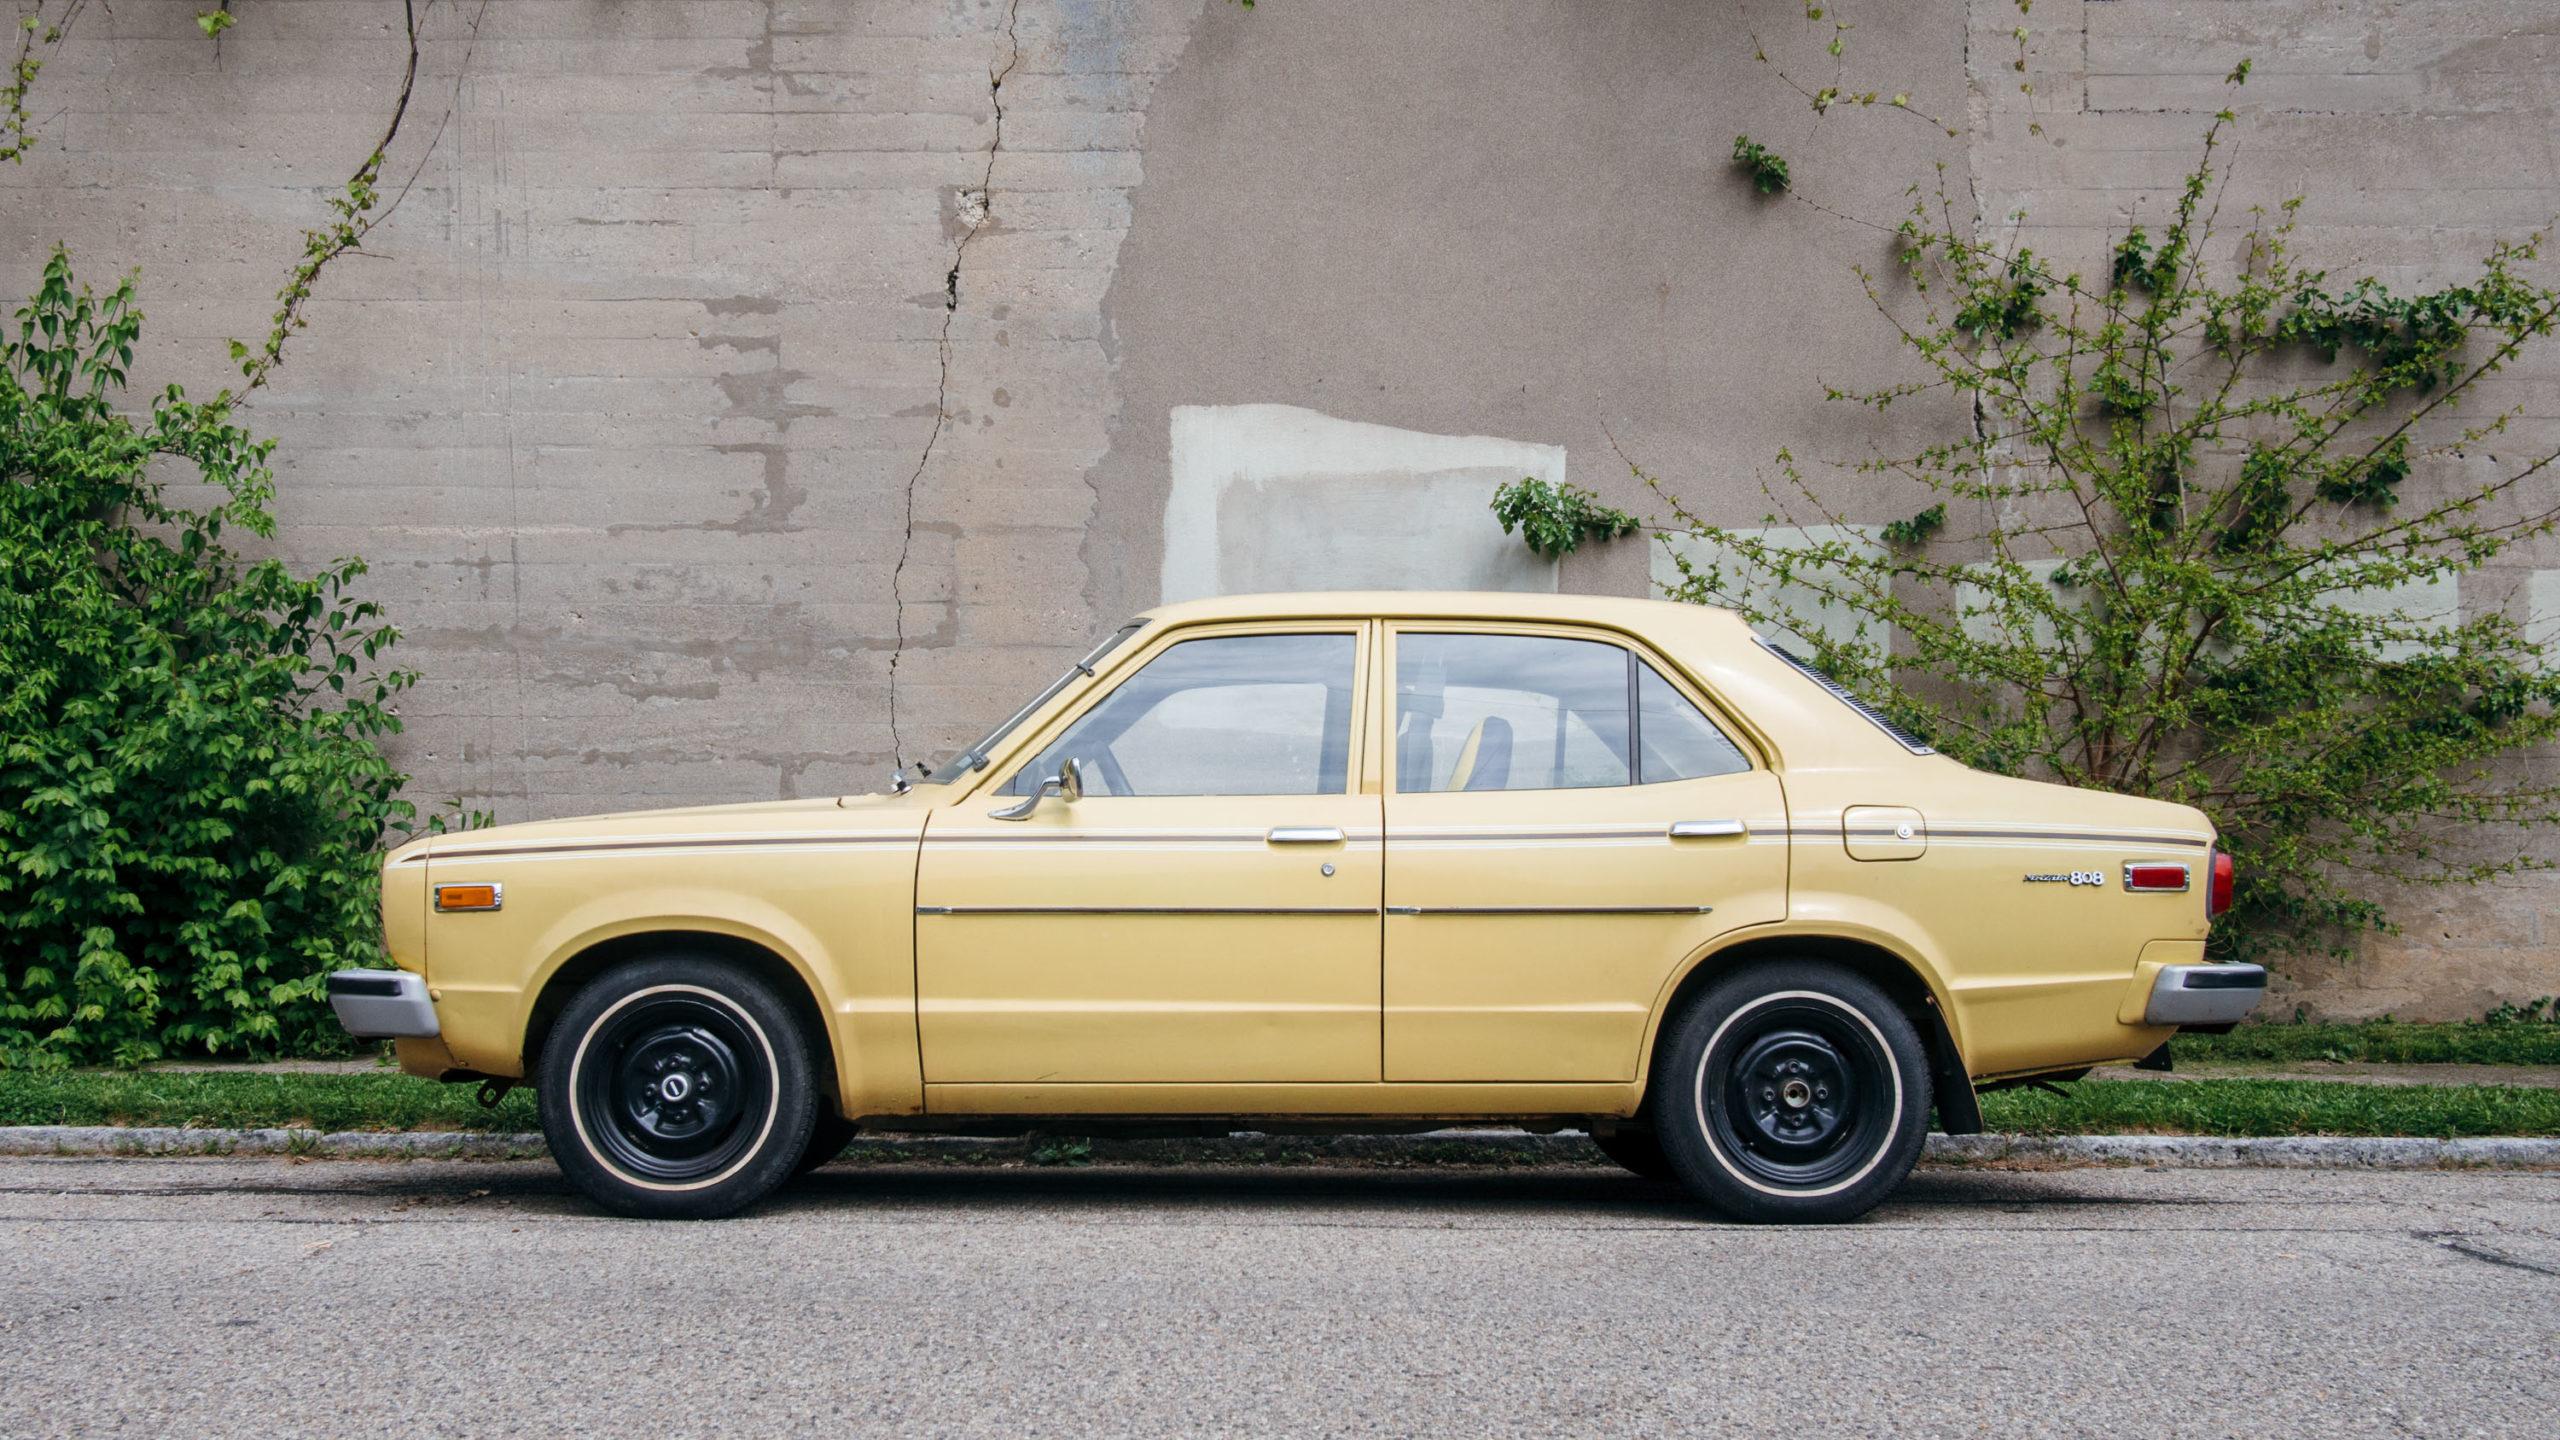 an old yellow Mazda car